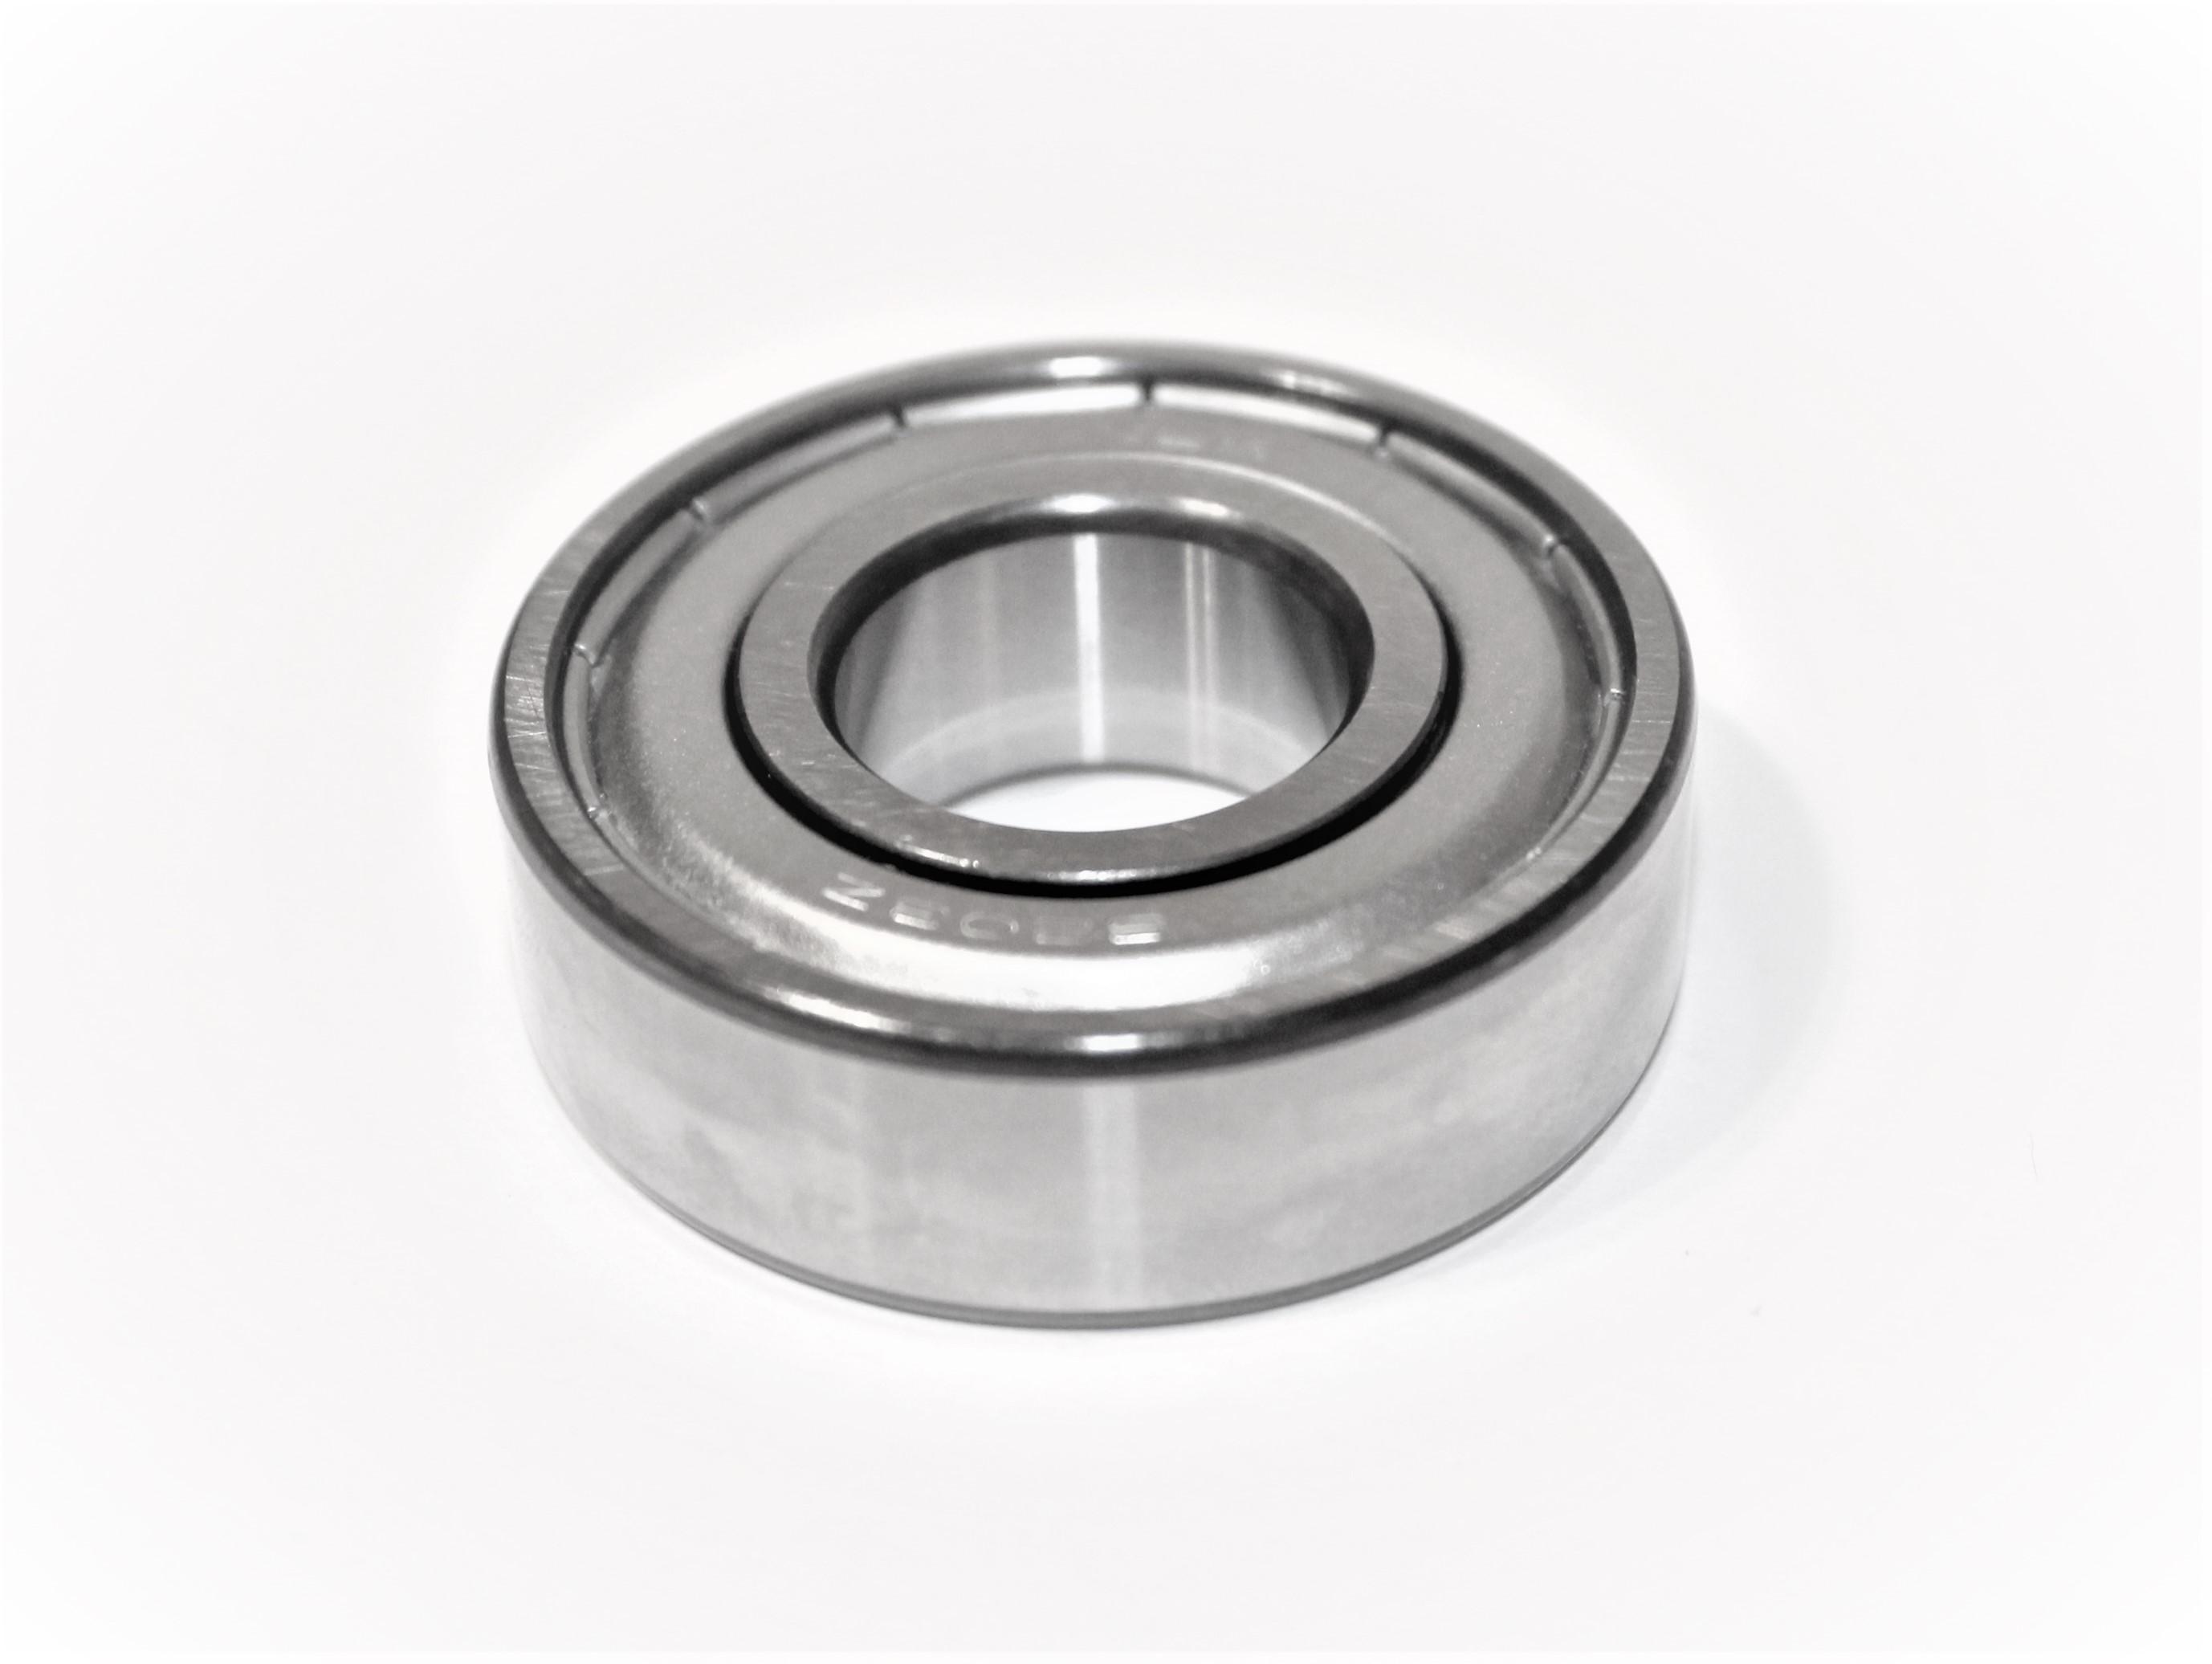 Genuine Toyota® FZJ80 Power Steering Pump Seal Kit